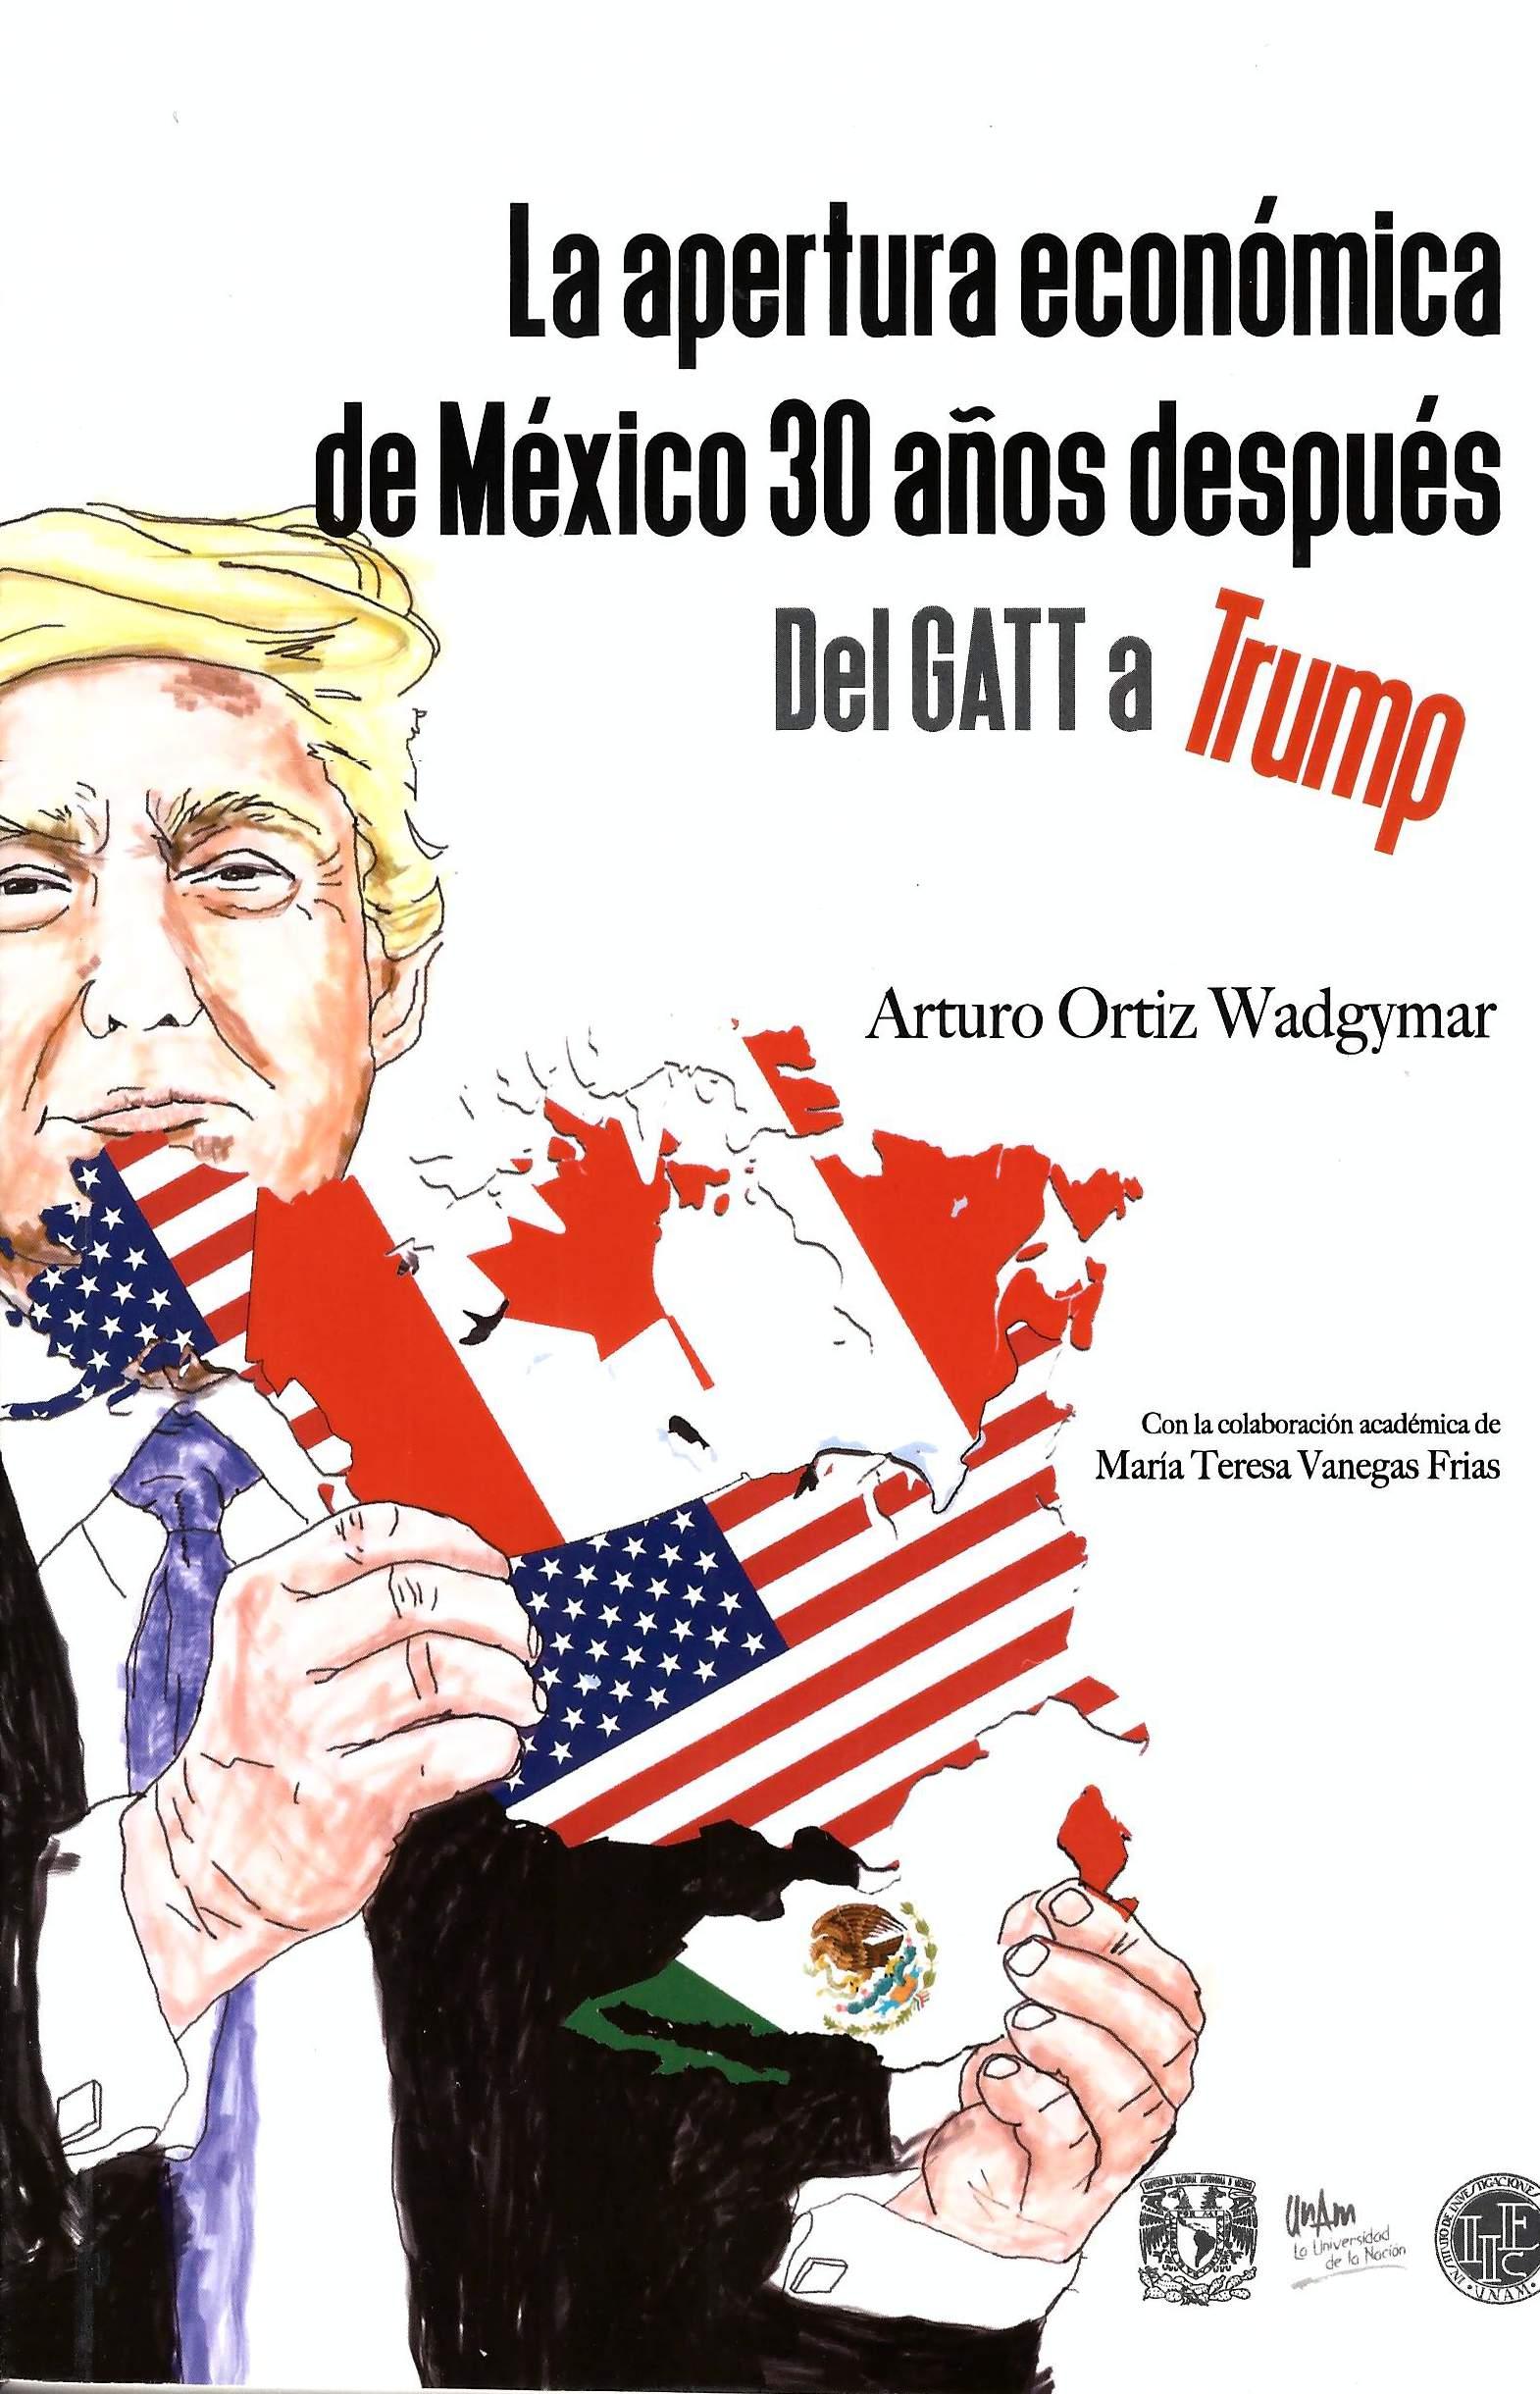 La apertura económica de México 30 años después del GATT a Trump